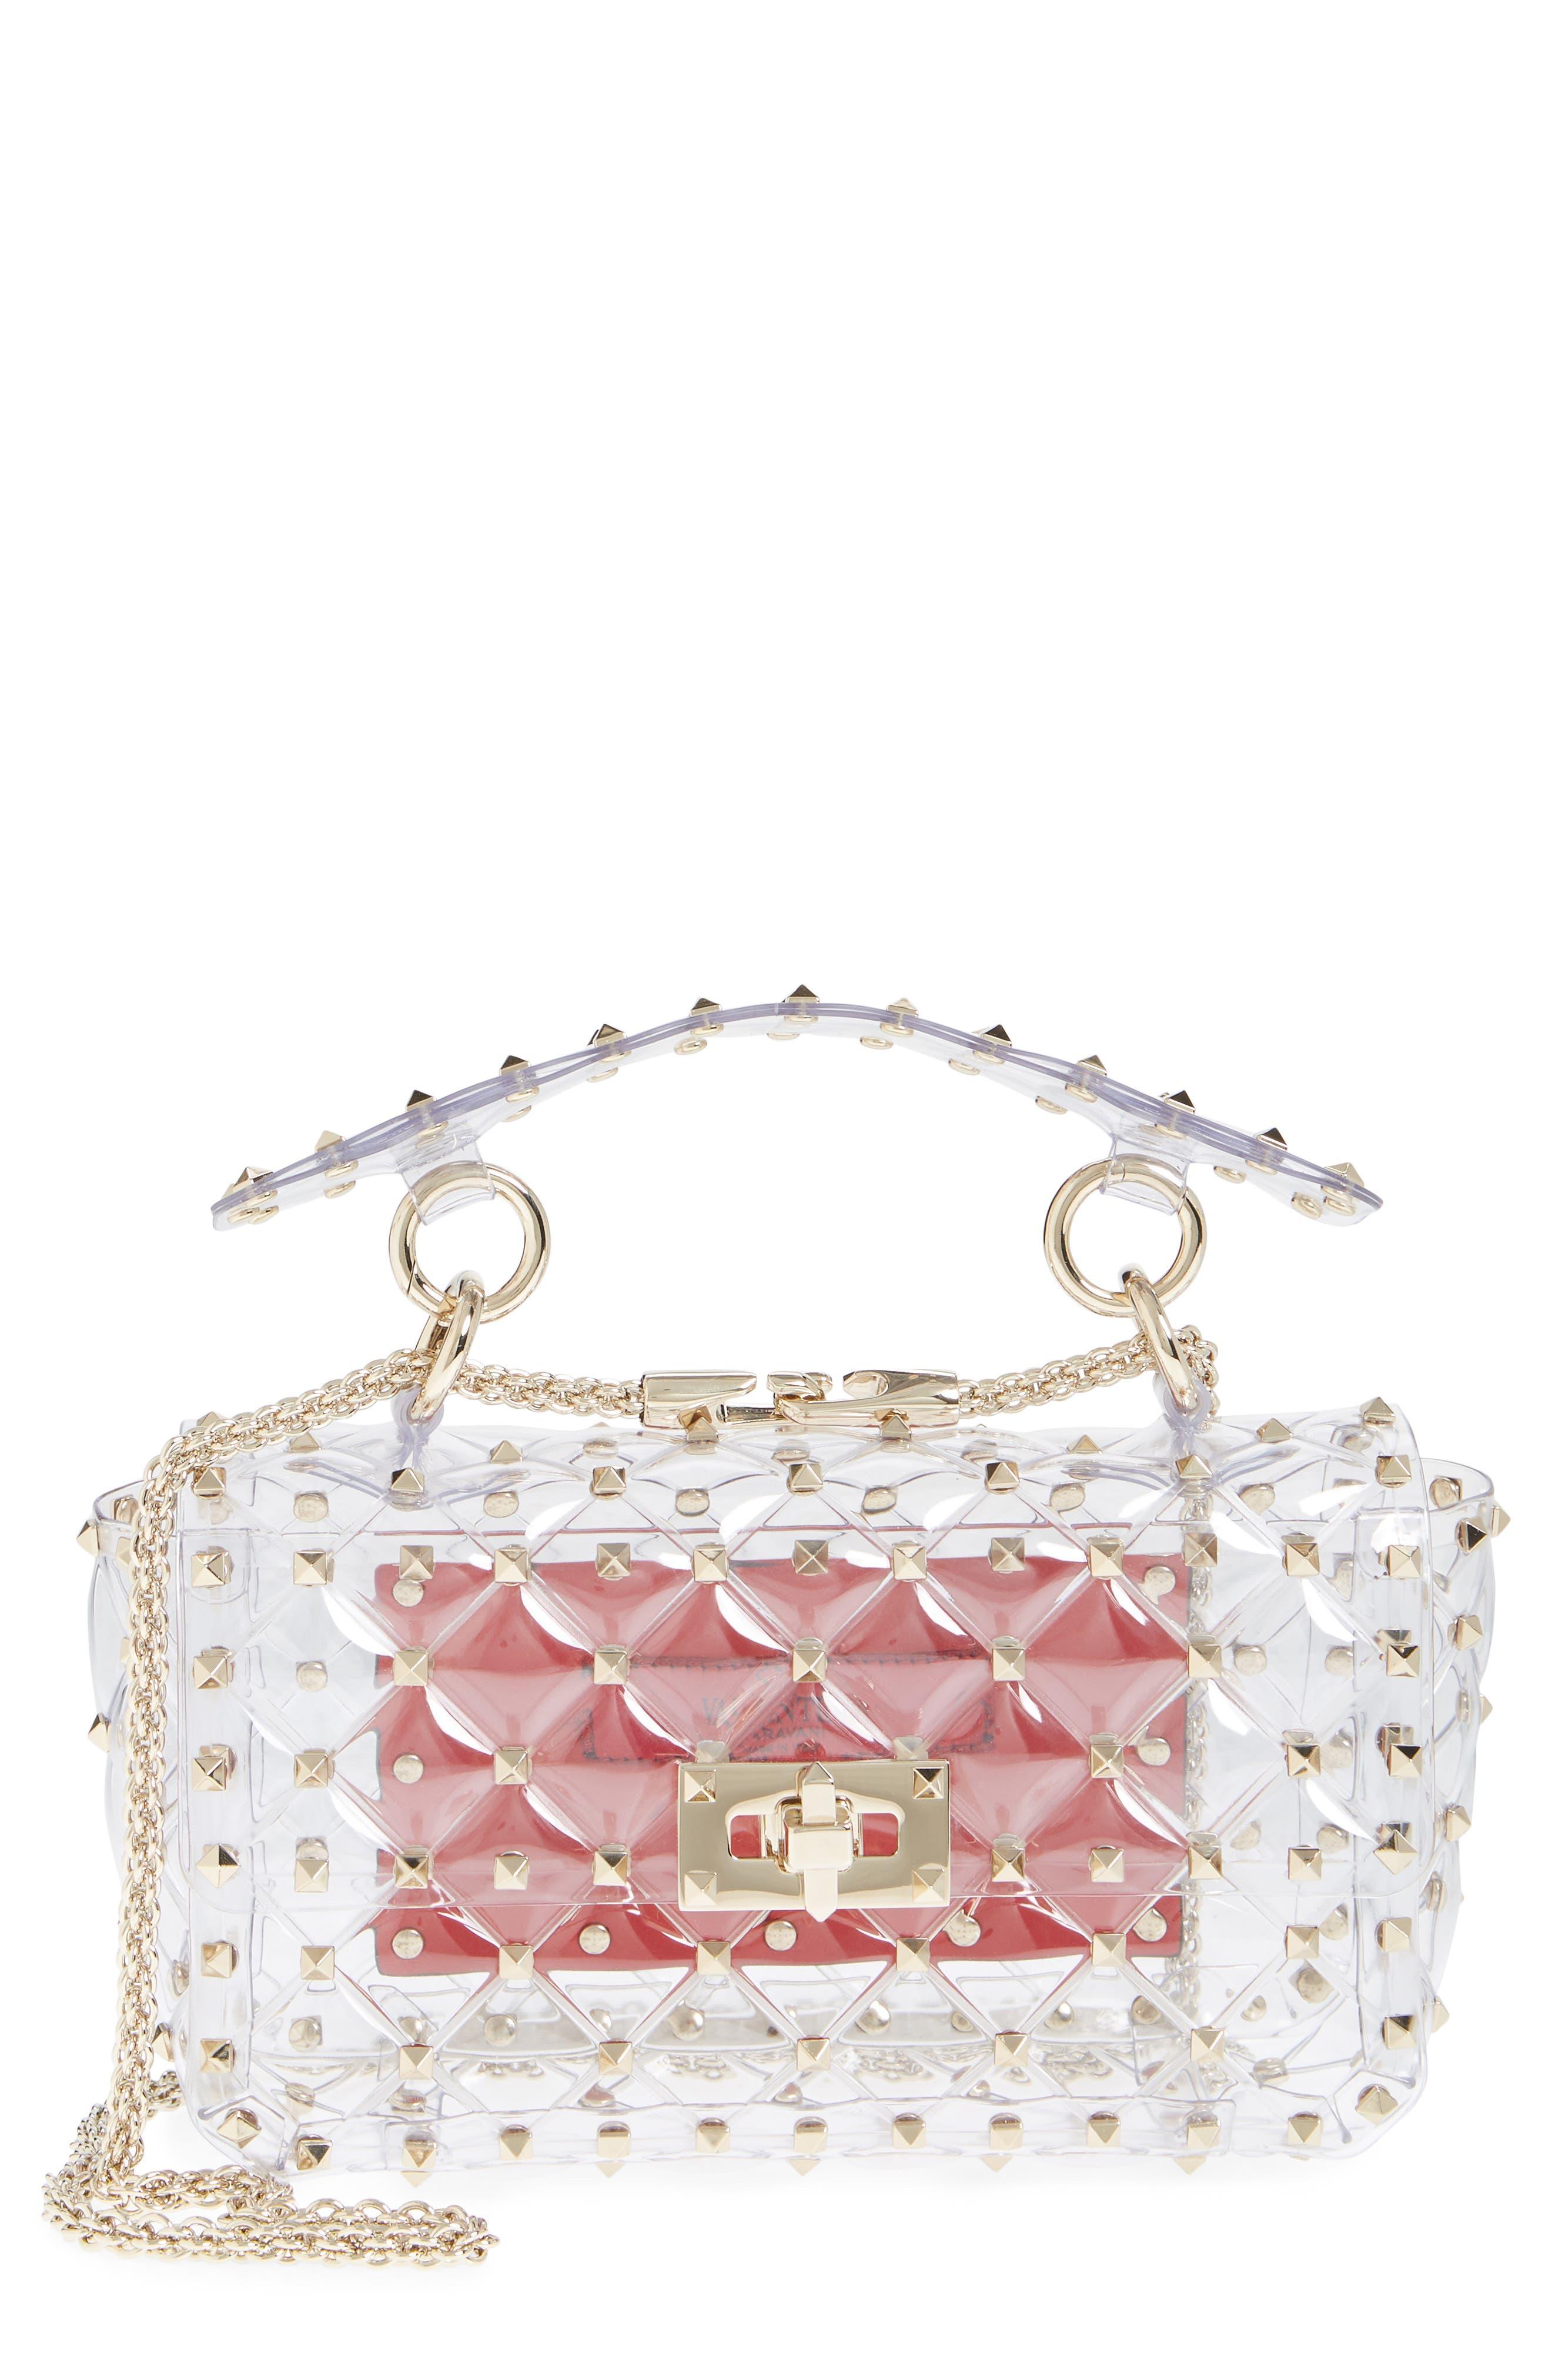 VALENTINO GARAVANI Rockstud Transparent Small Shoulder Bag